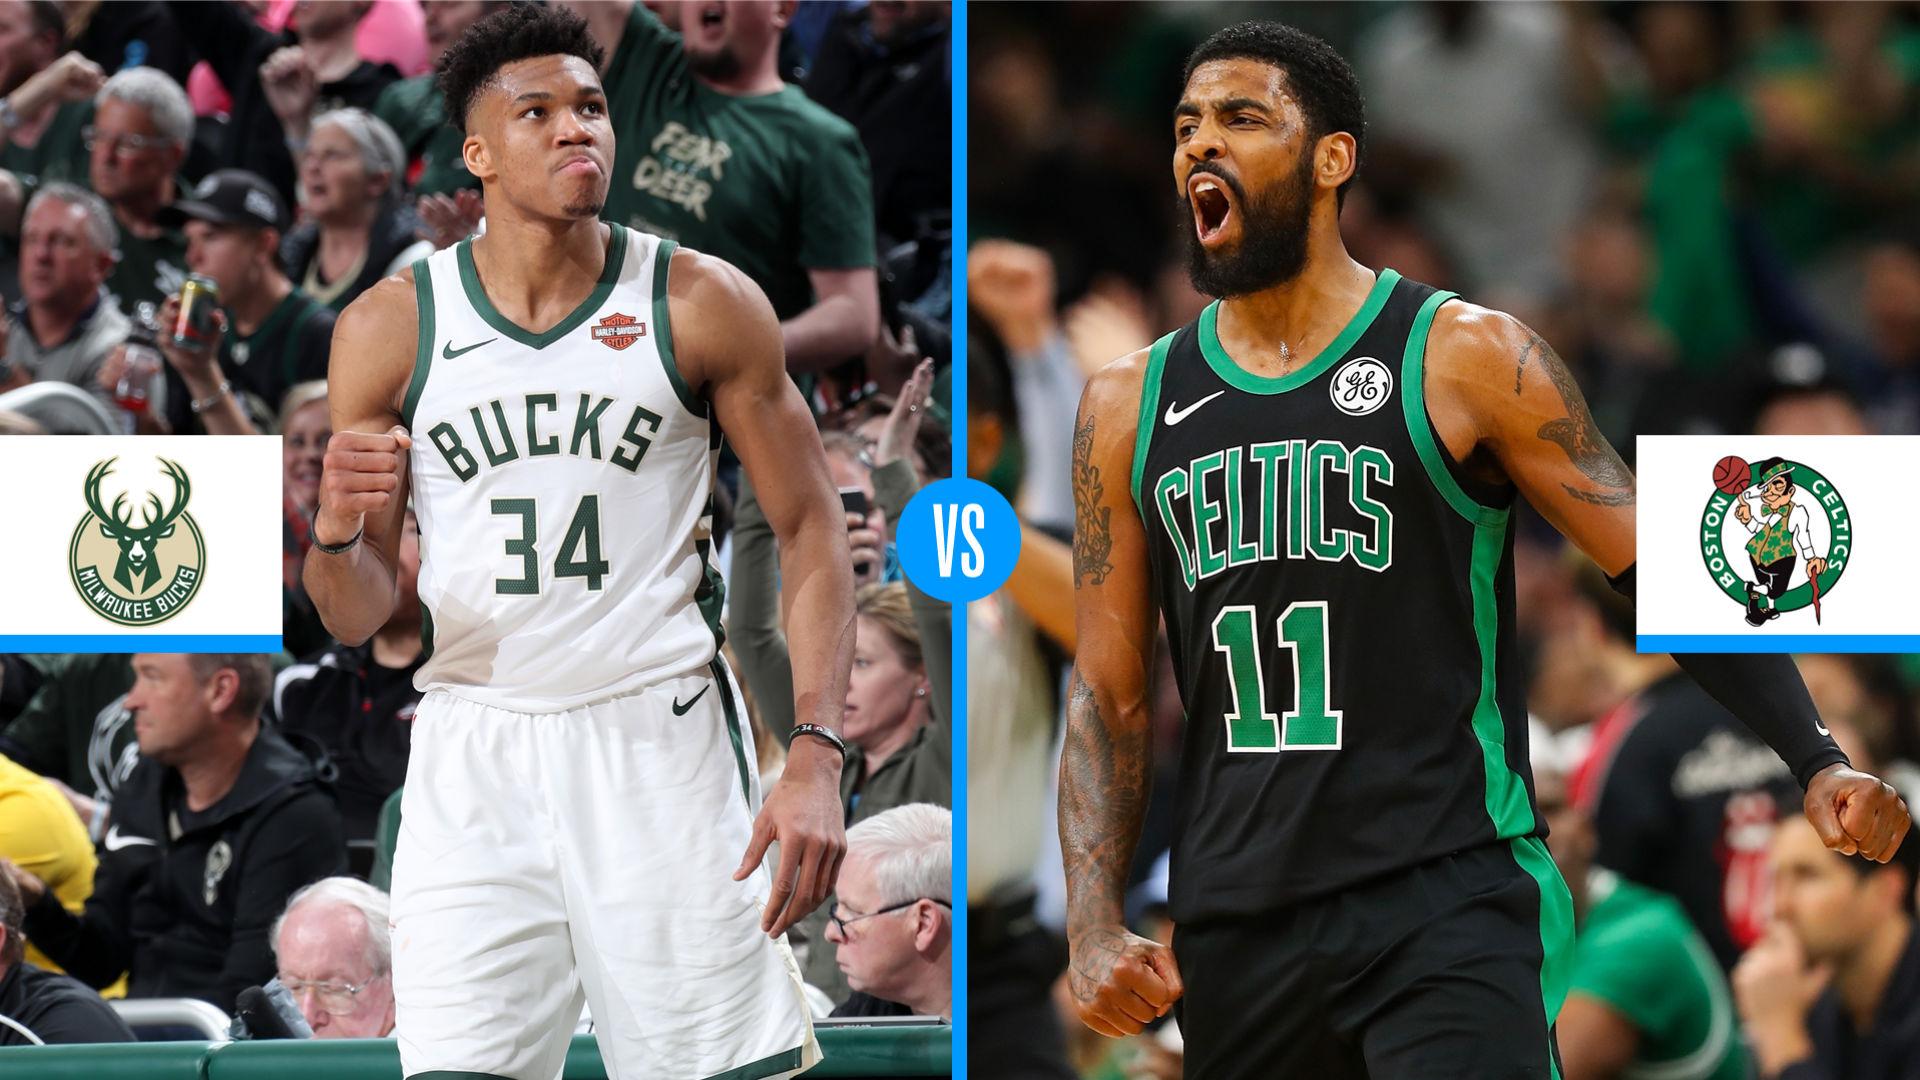 Nba Playoffs 2019 Milwaukee Bucks Vs Boston Celtics